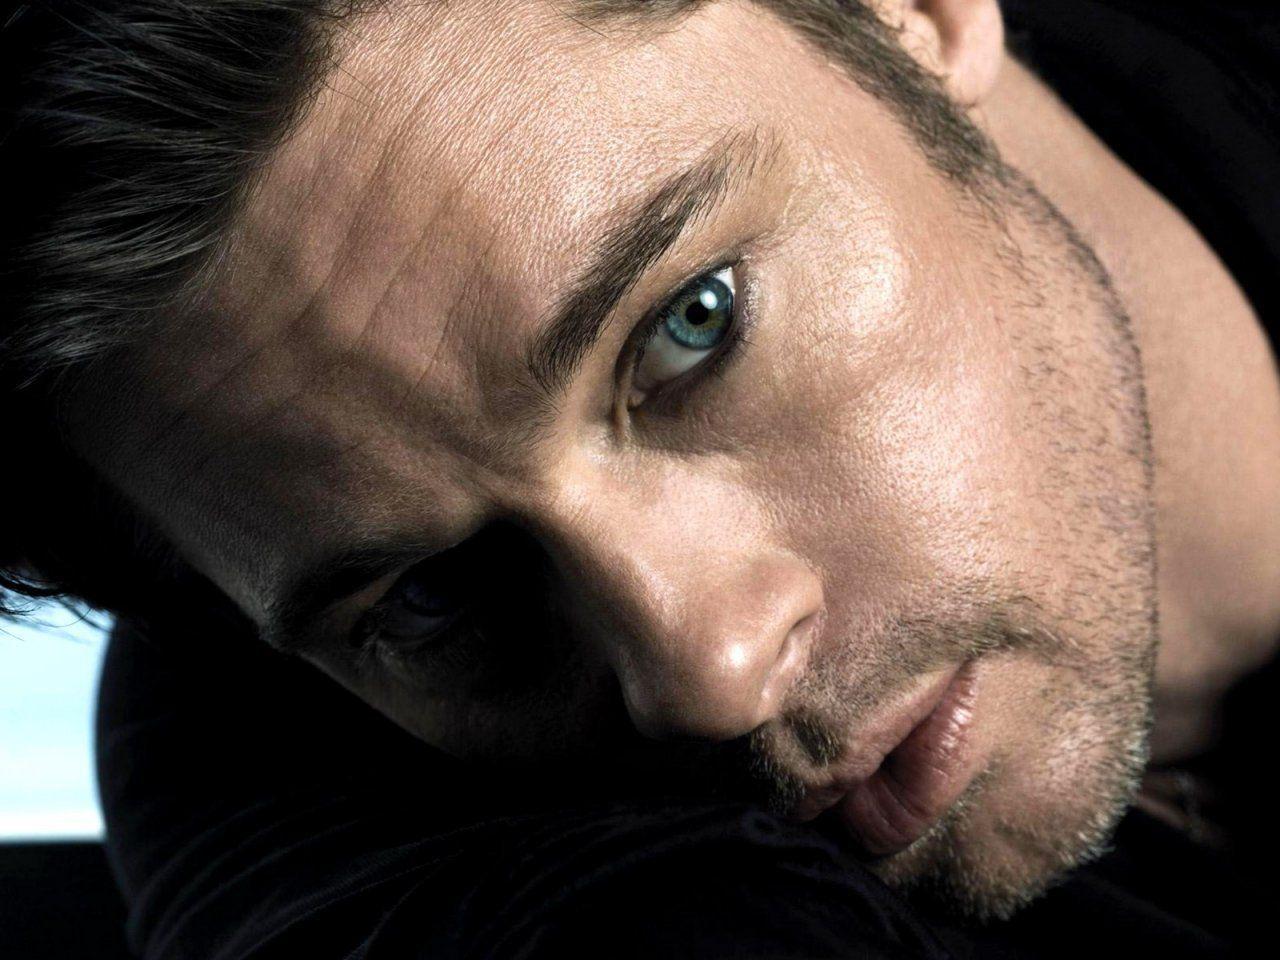 Brad Pitt Wallpapers - Wallpaper Cave - photo #11